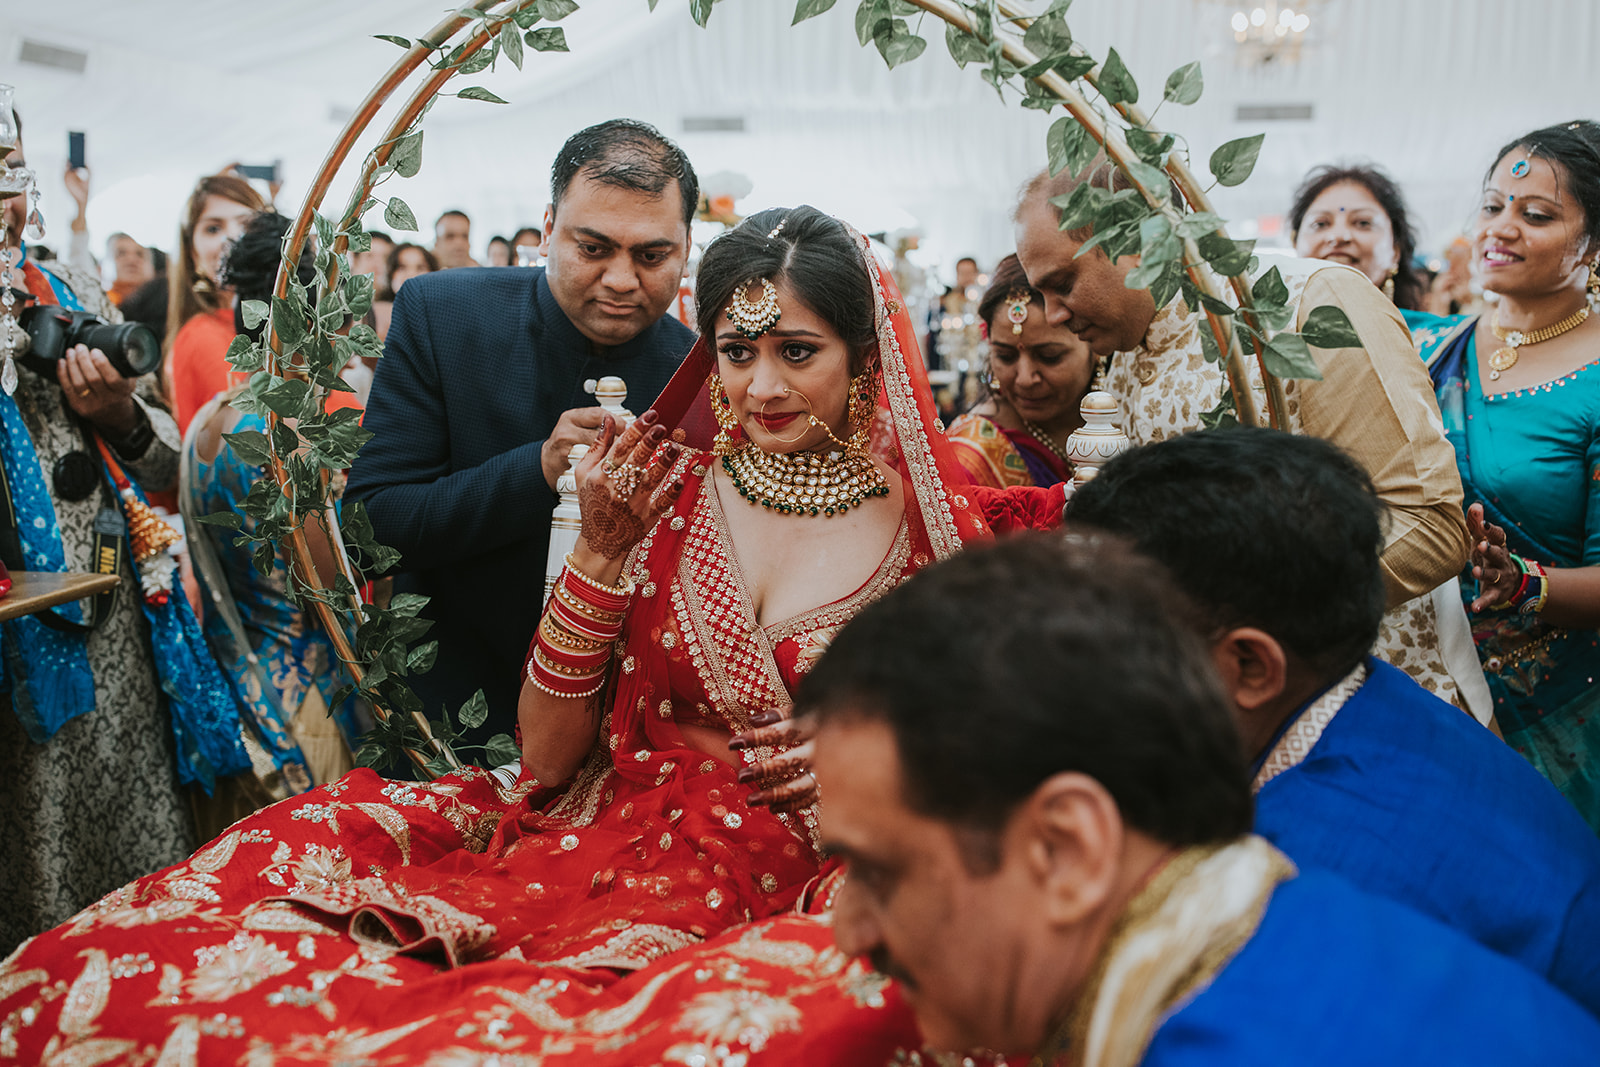 CEREMONY - A Romantic Hindu Wedding